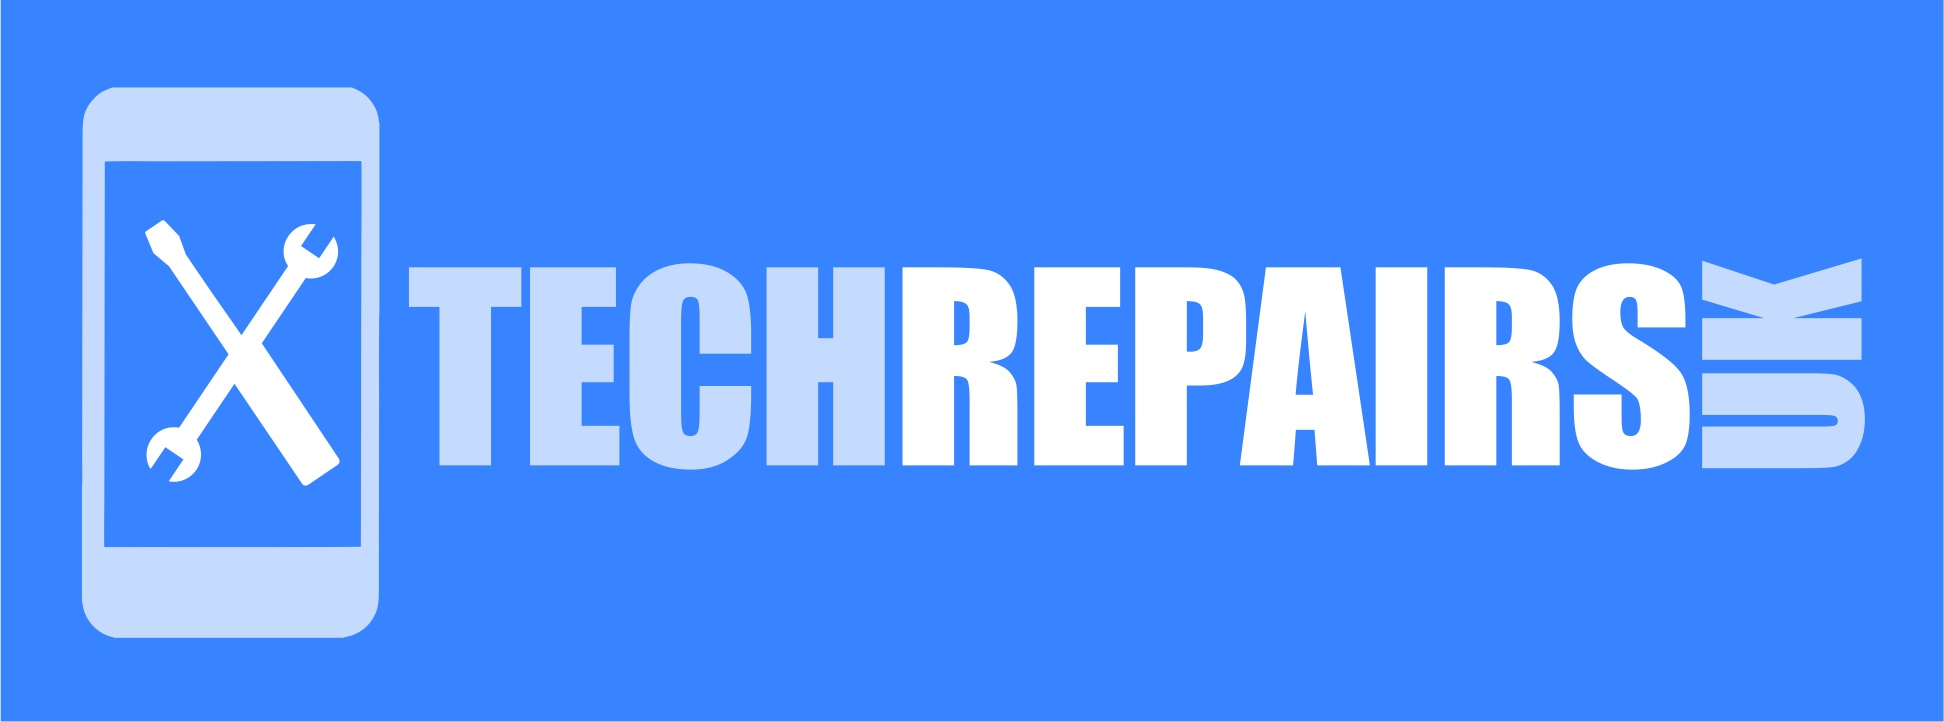 Read Tech Repairs UK Reviews